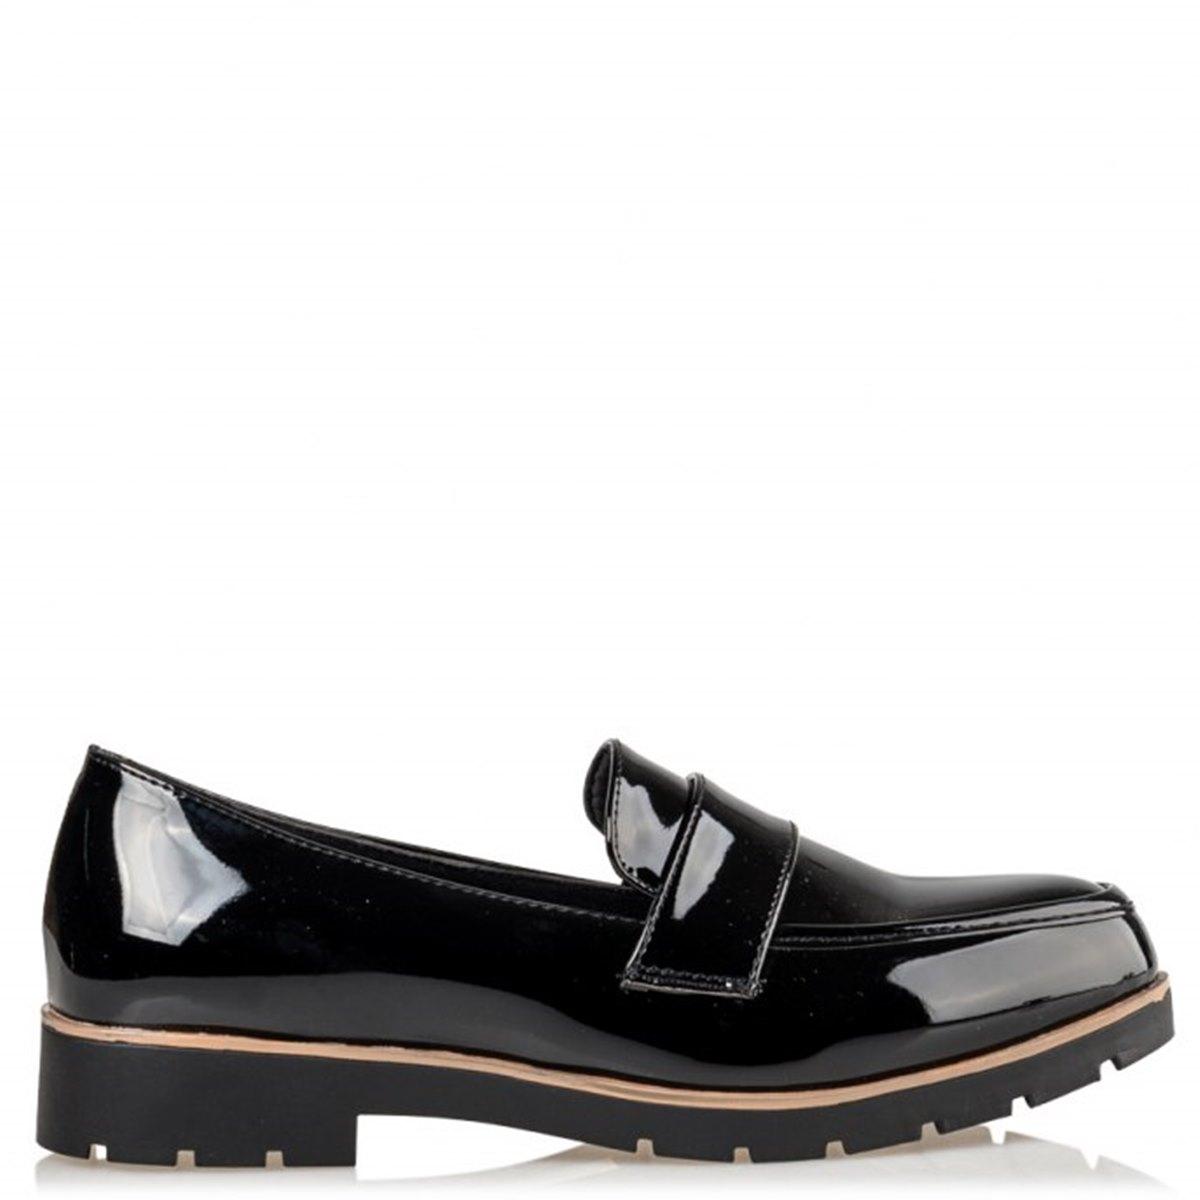 Venini by Envie loafer S15-12963 Black